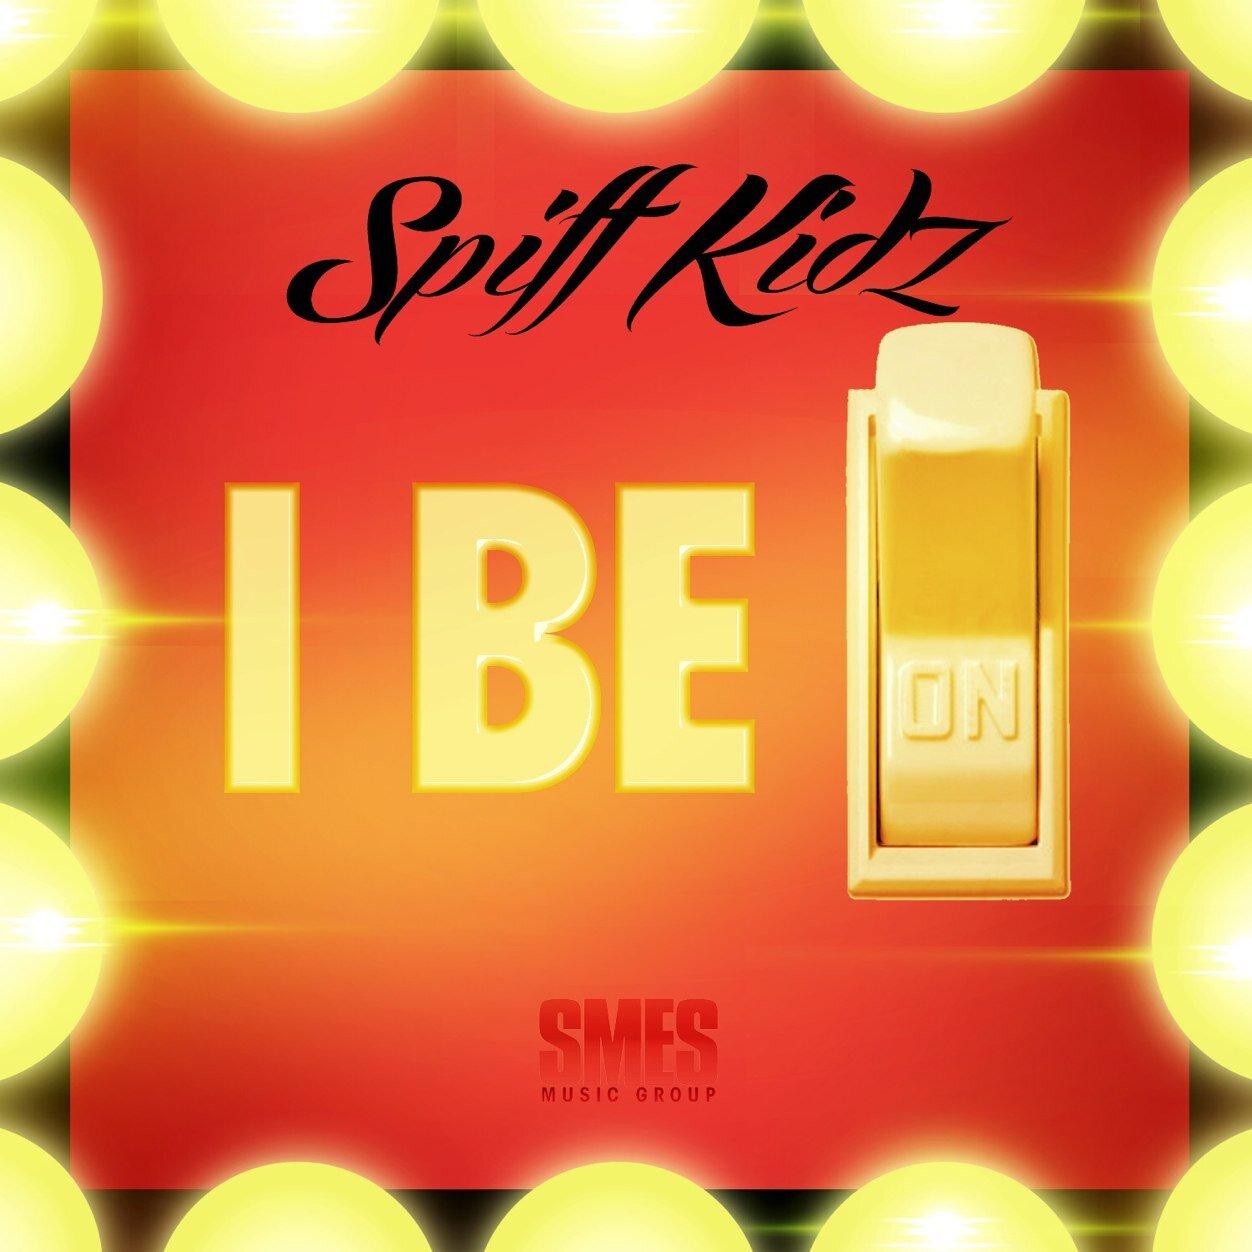 Spiff Kidz's profile